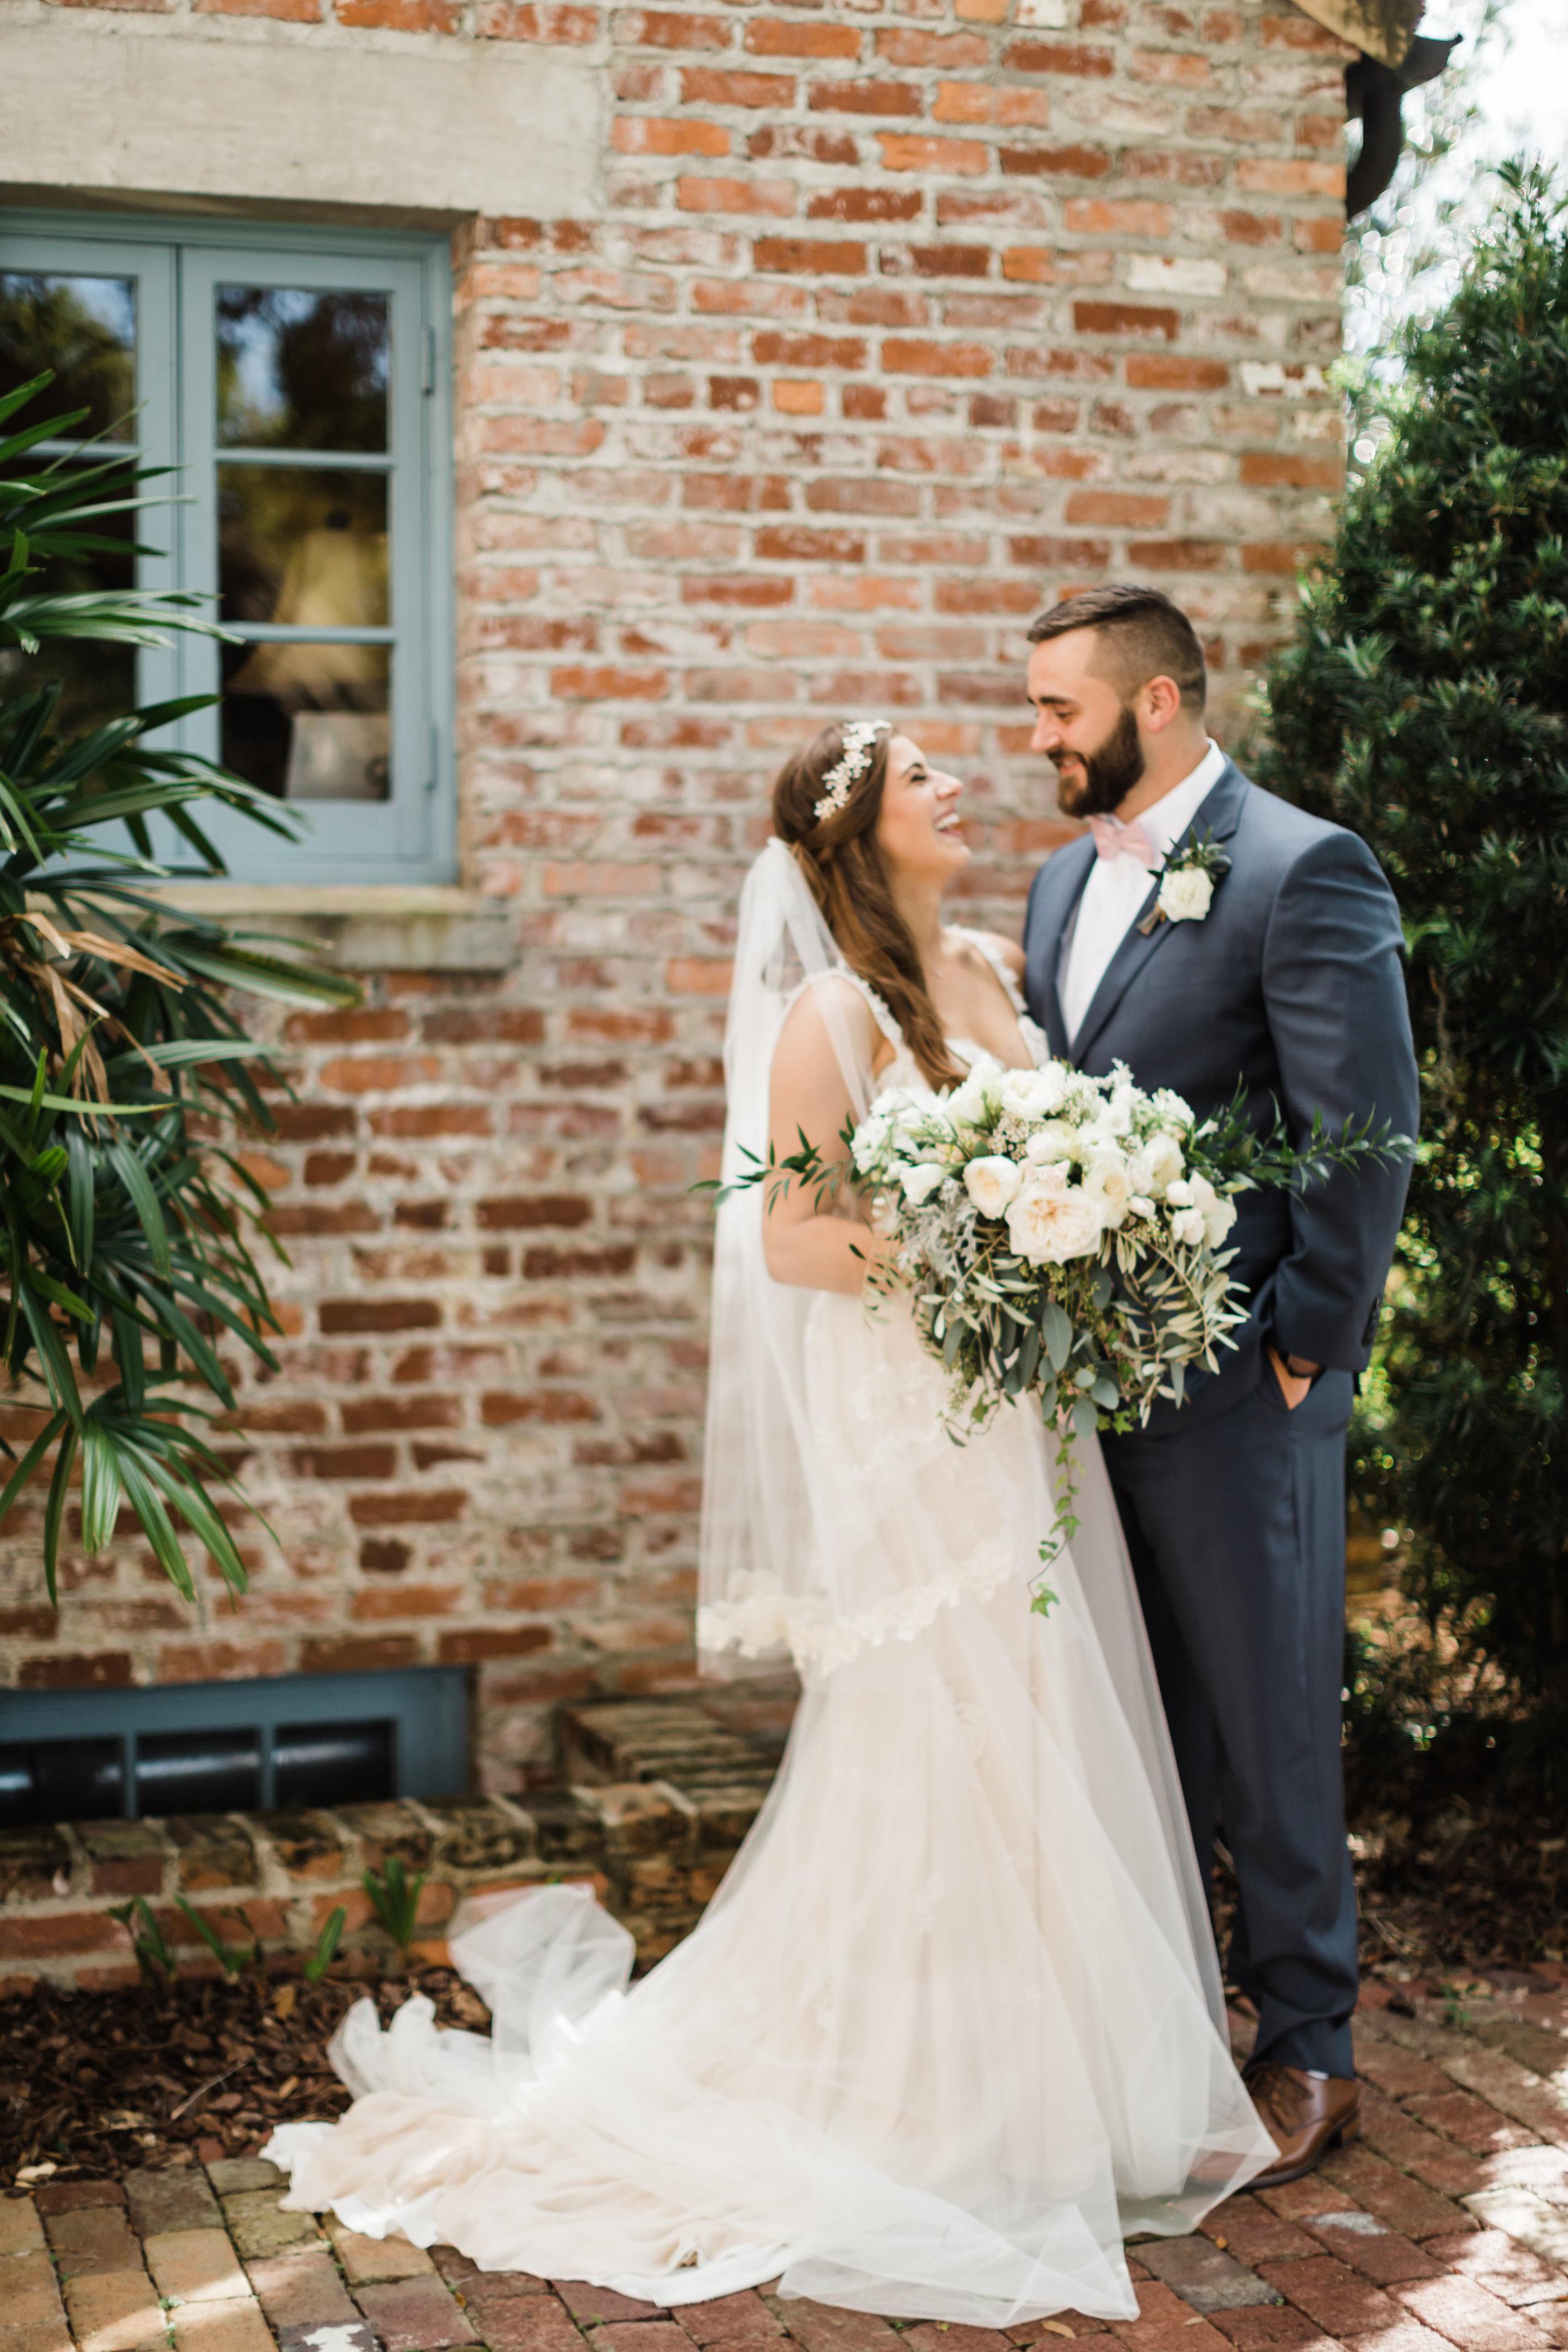 2017.10.15 Steffi and Elliott Simmonds Casa Feliz Wedding (222 of 969).jpg